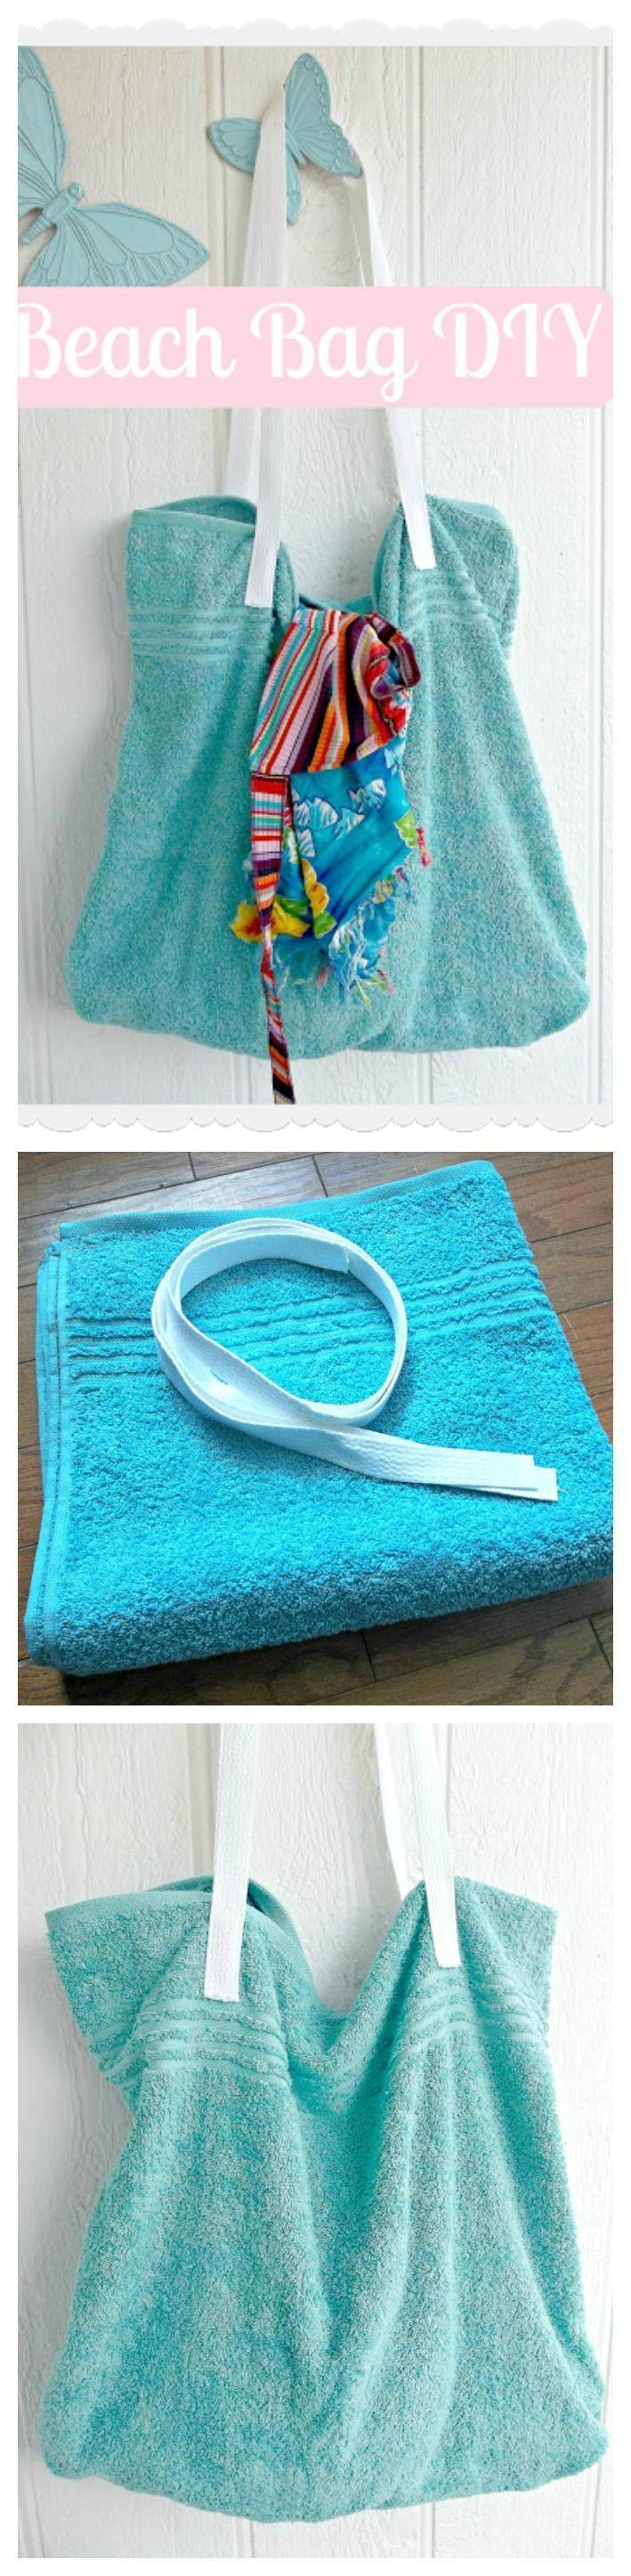 A simple Beach Bag DIY from a BATH TOWEL! Easy sewing tutorial.